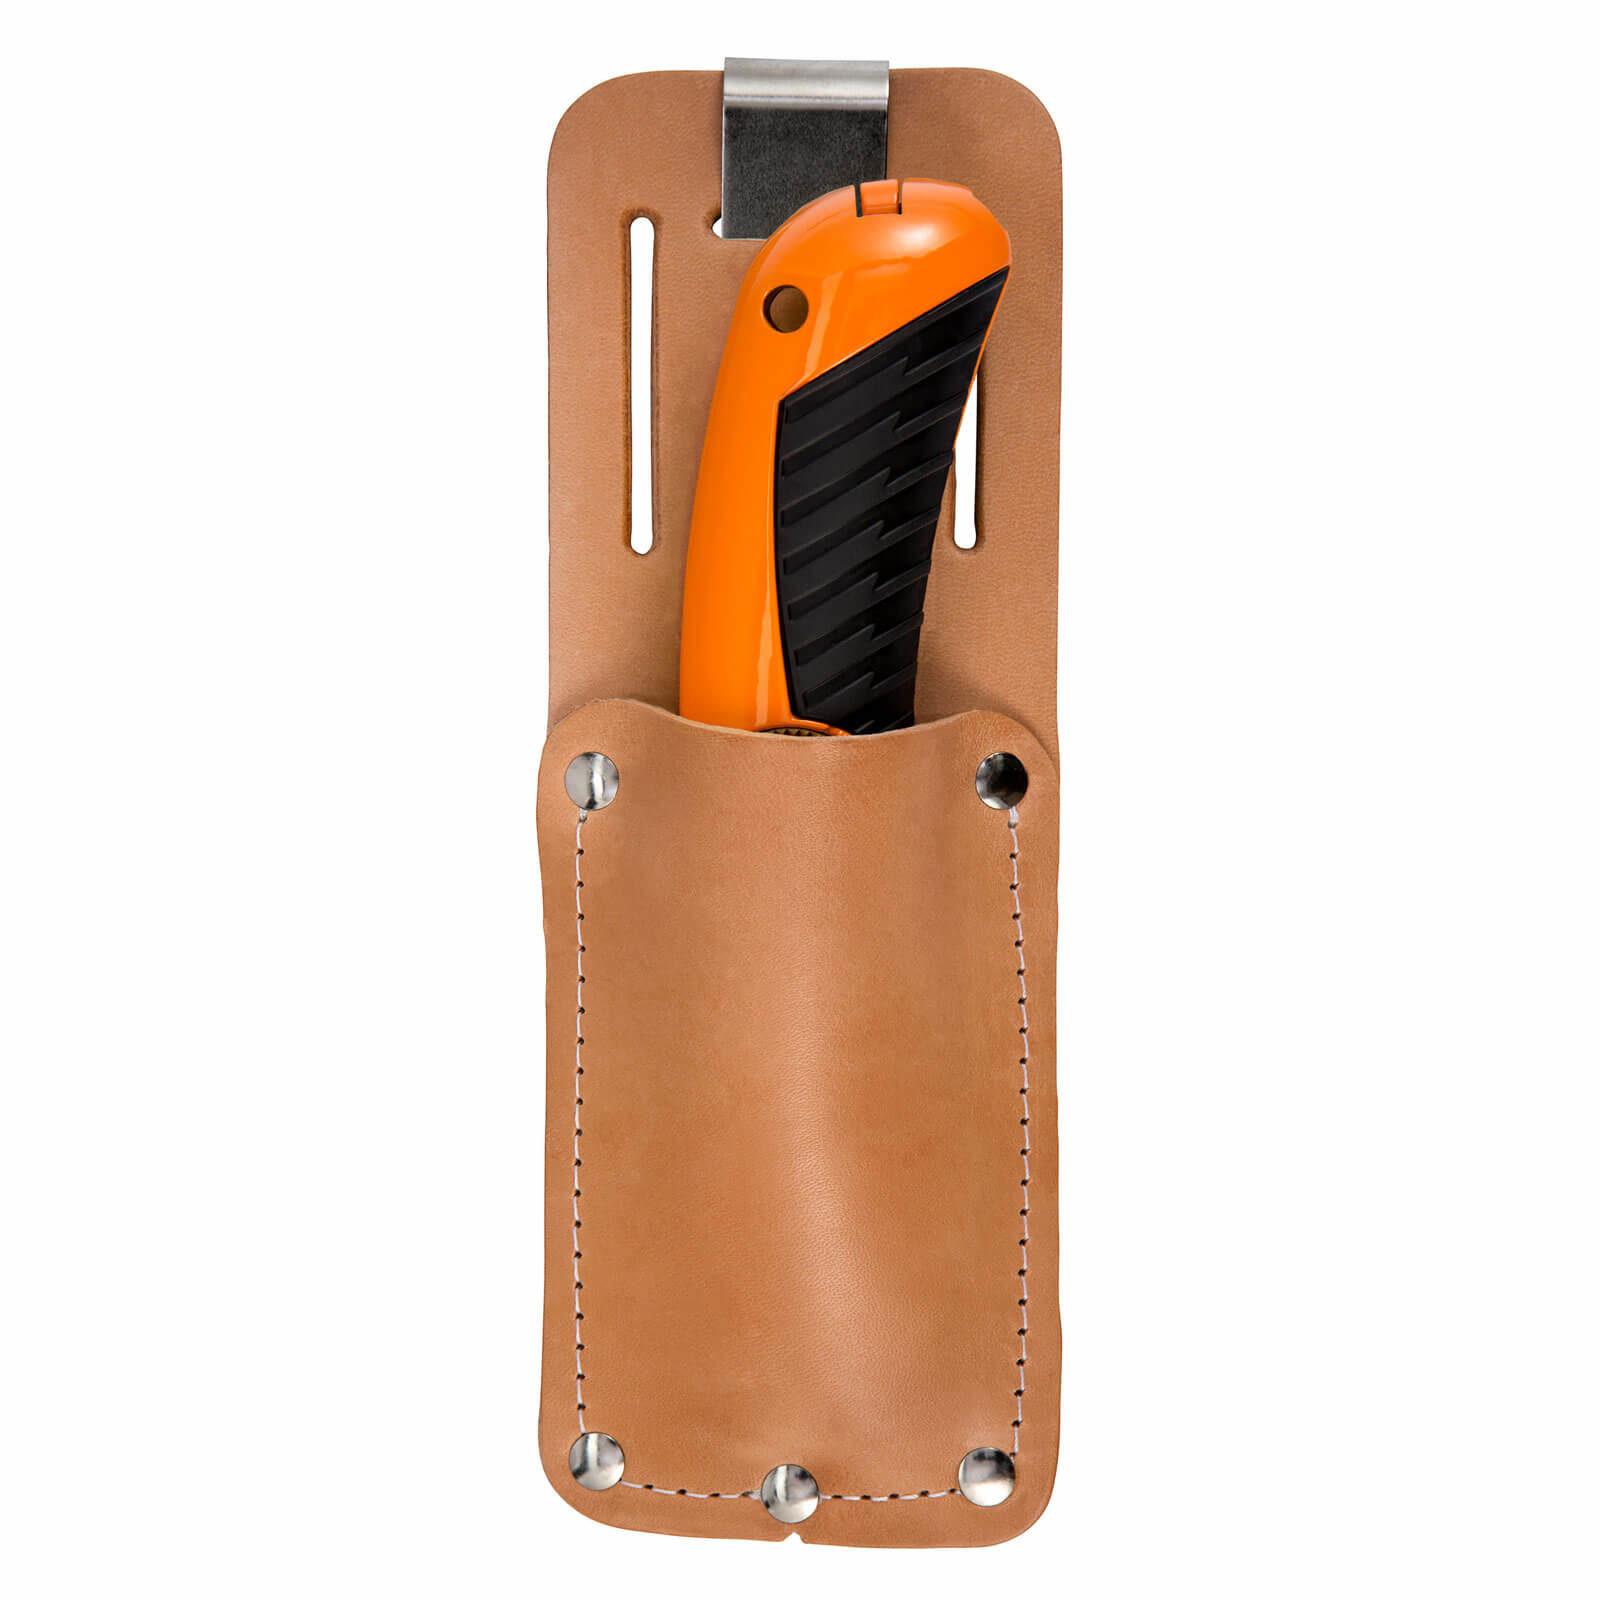 U032-Sicherheitsmesser-Profi-automatisch-kurz-PHC-QBS-20–Lederholster-CURT-tools_1600